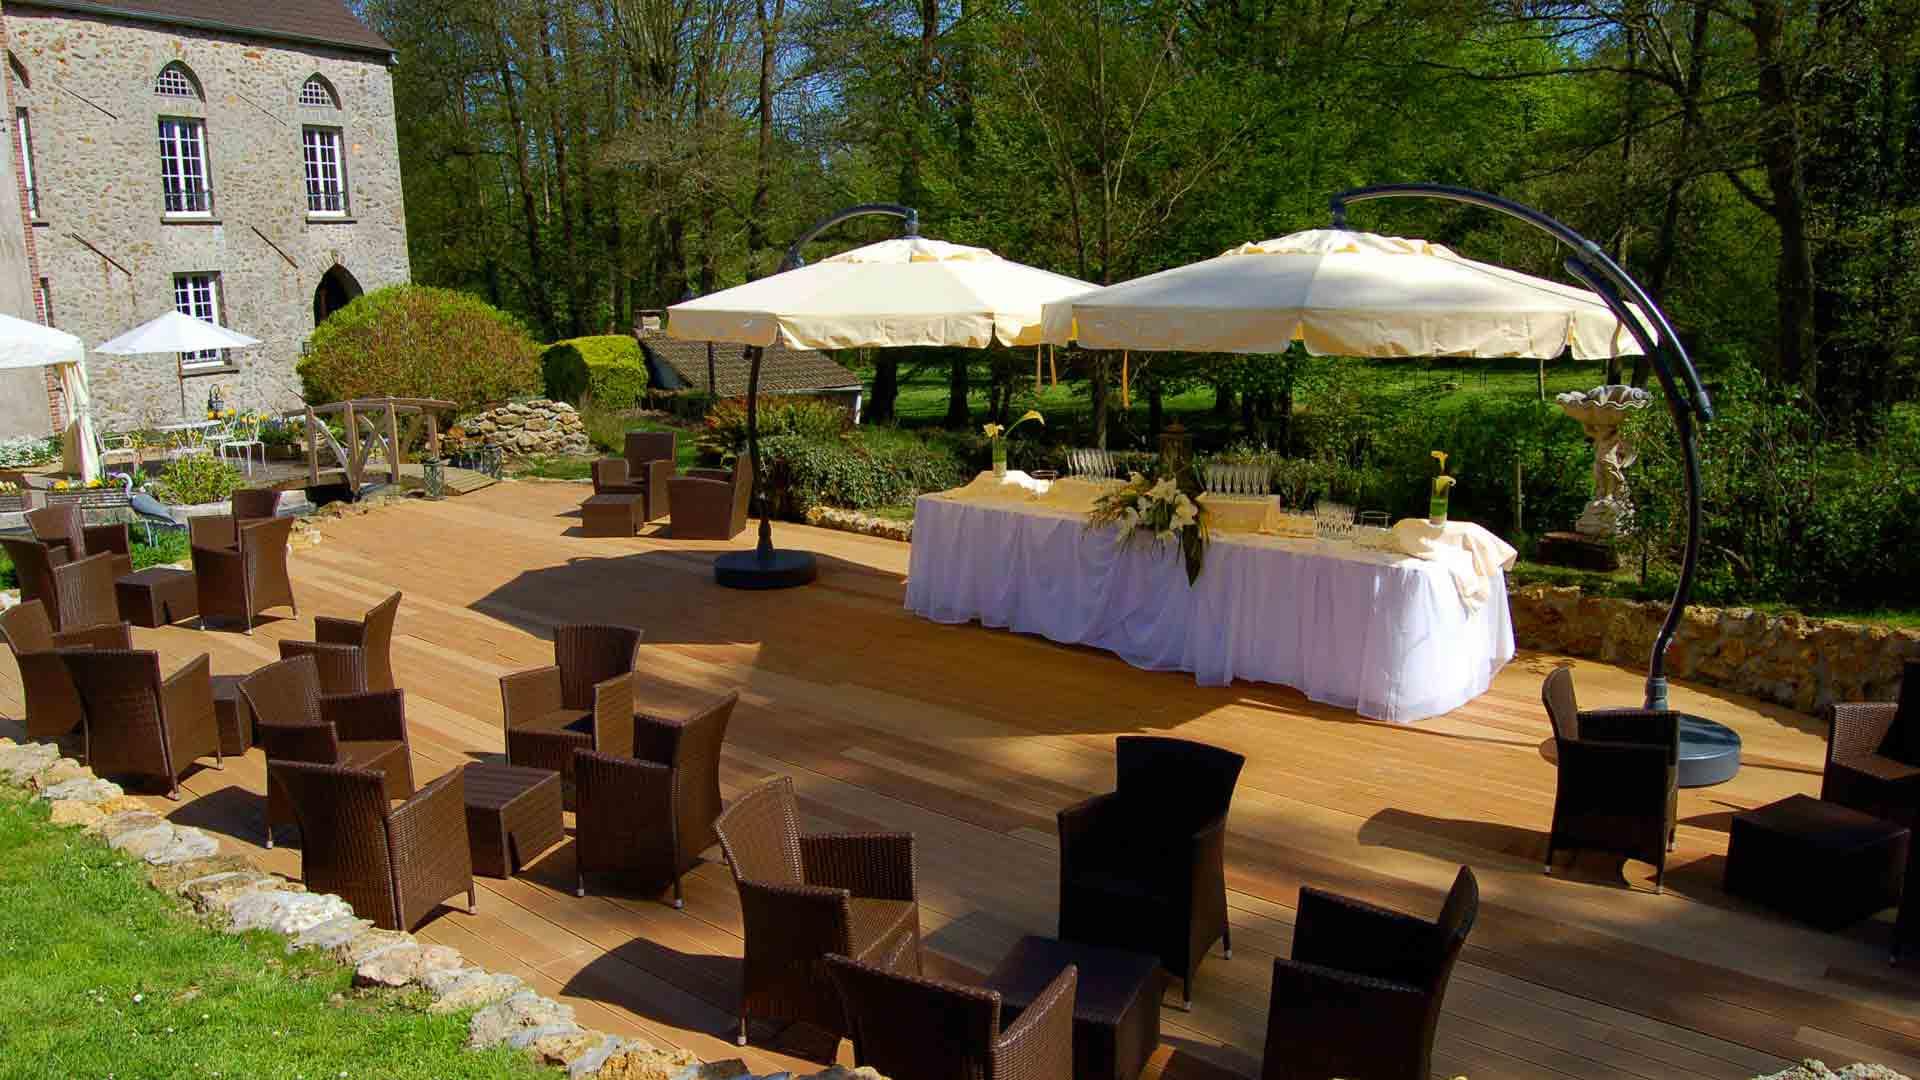 salle de mariage 77 seine et marne prieure st cyr. Black Bedroom Furniture Sets. Home Design Ideas